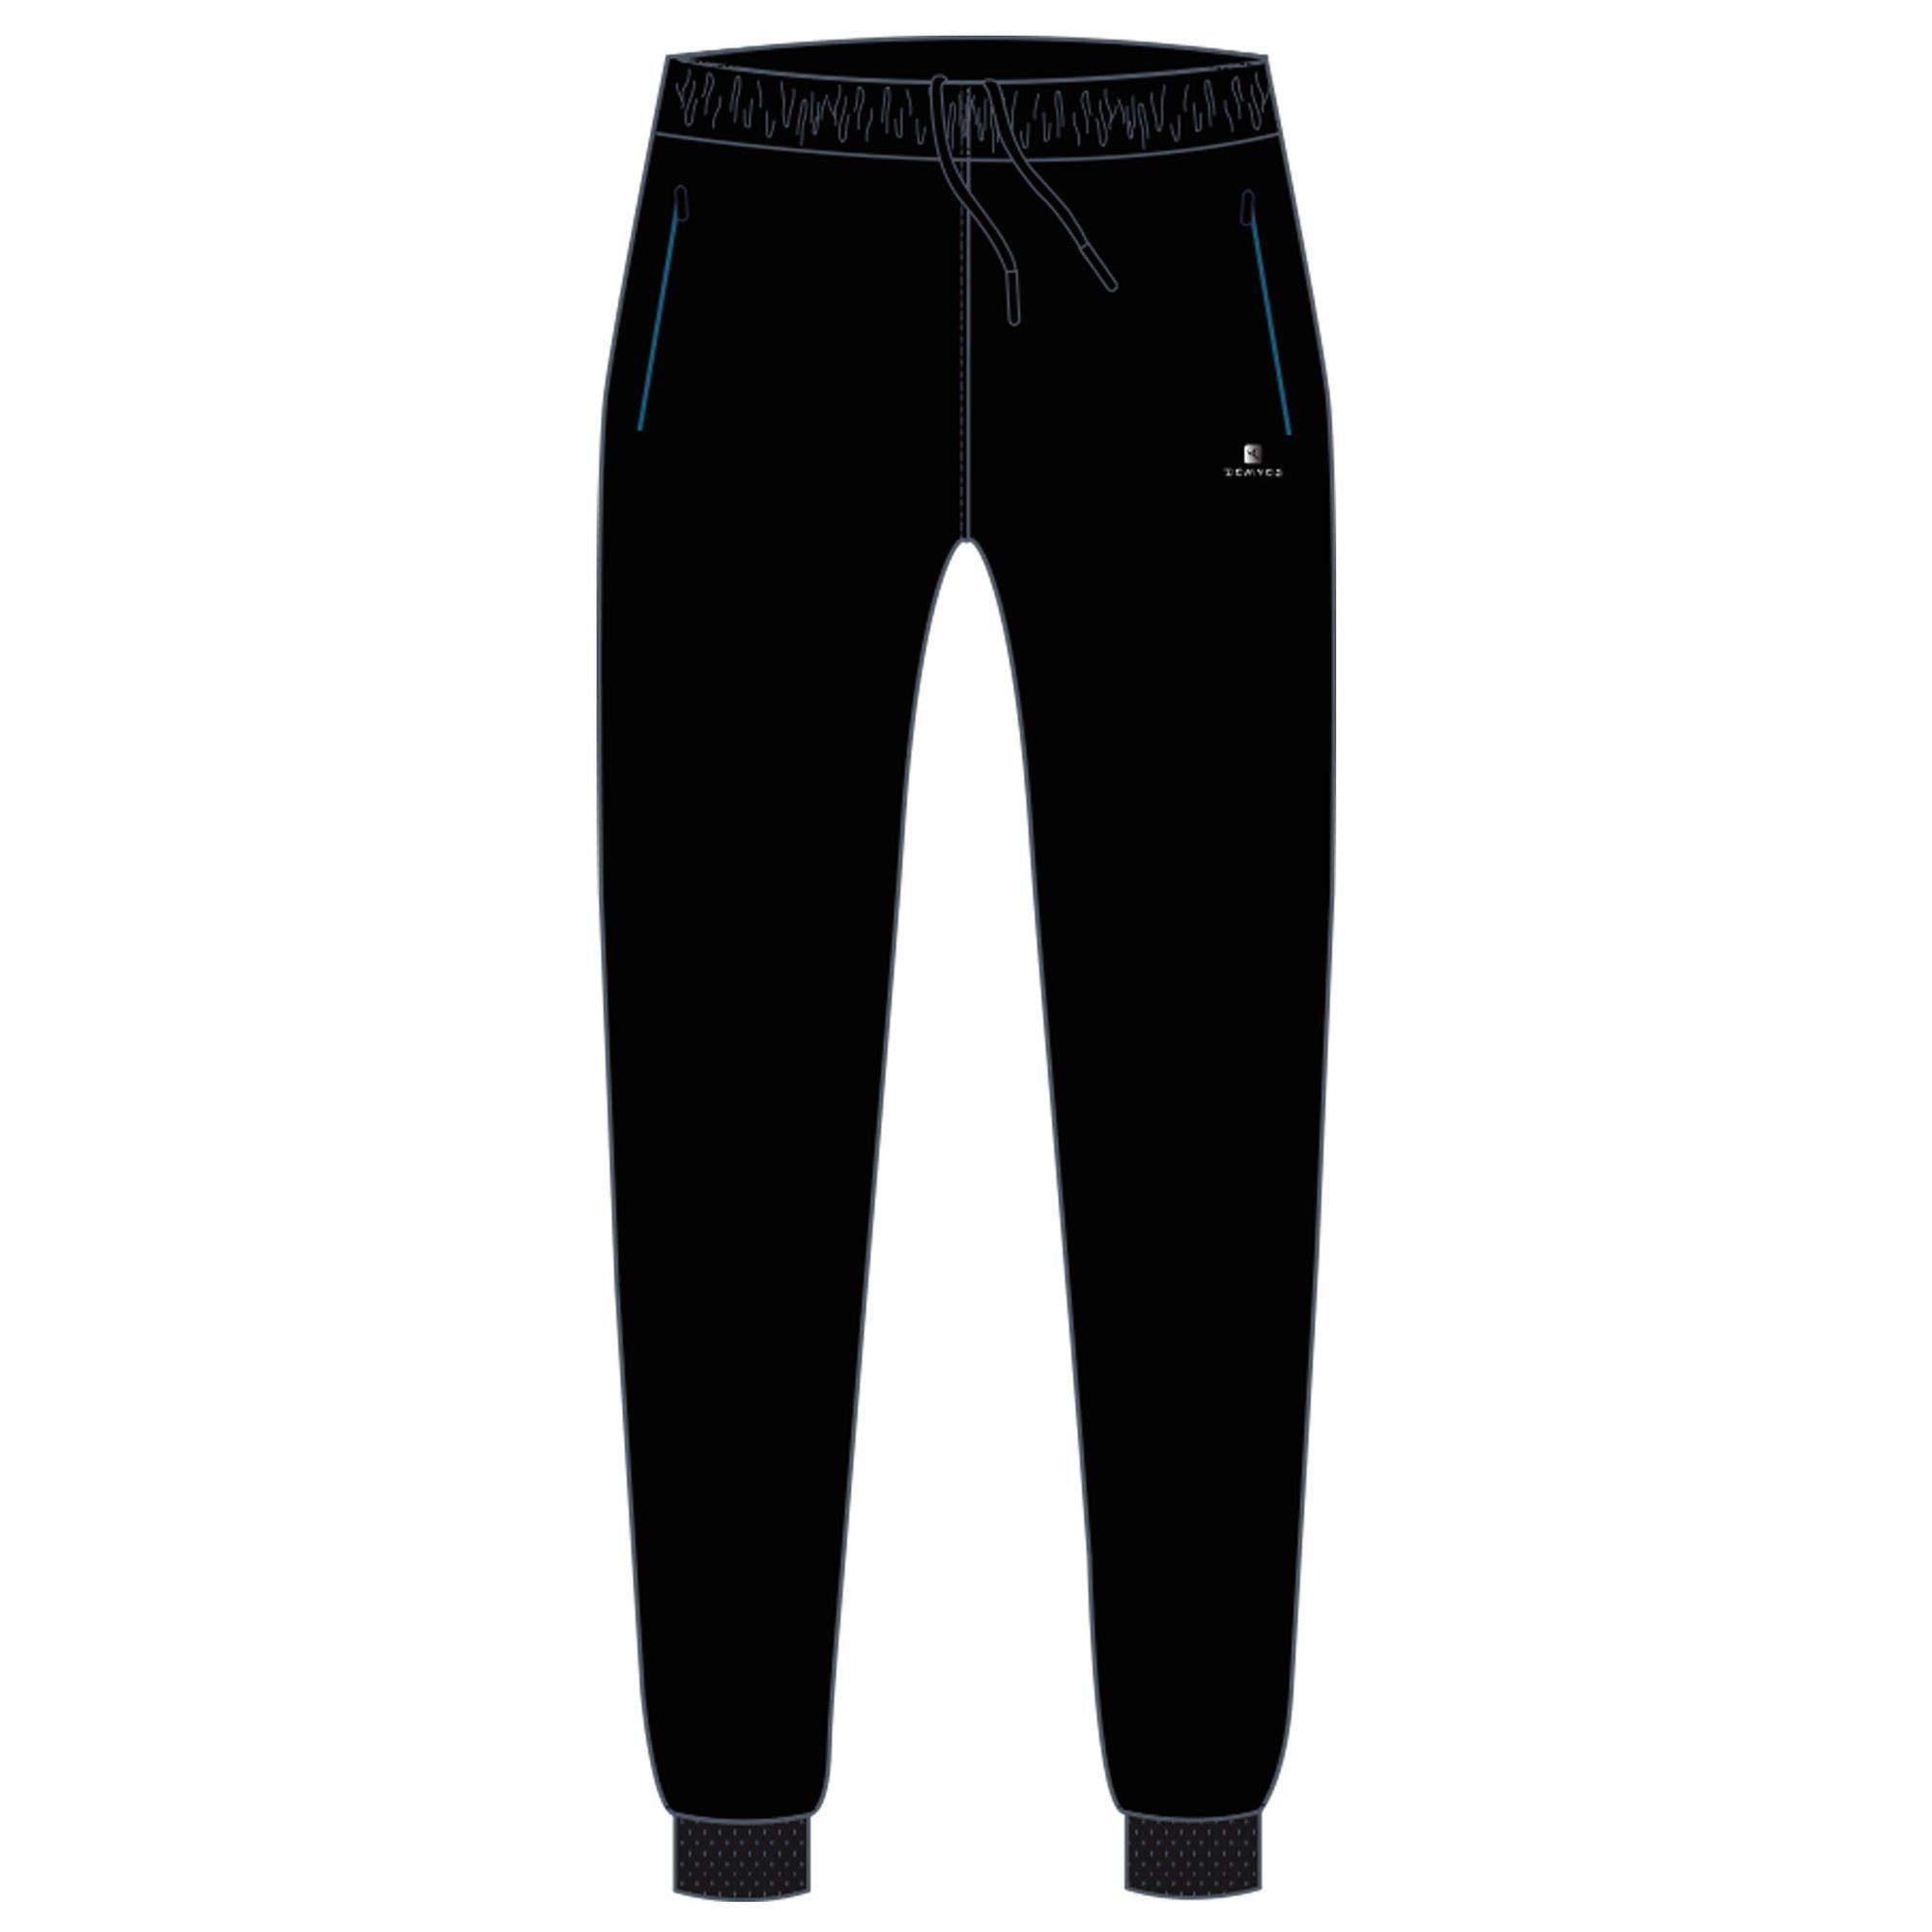 0b0f9a73f2d8c Pantalon chaud, synthétique respirant S500 garçon GYM ENFANT noir   Domyos  by Decathlon